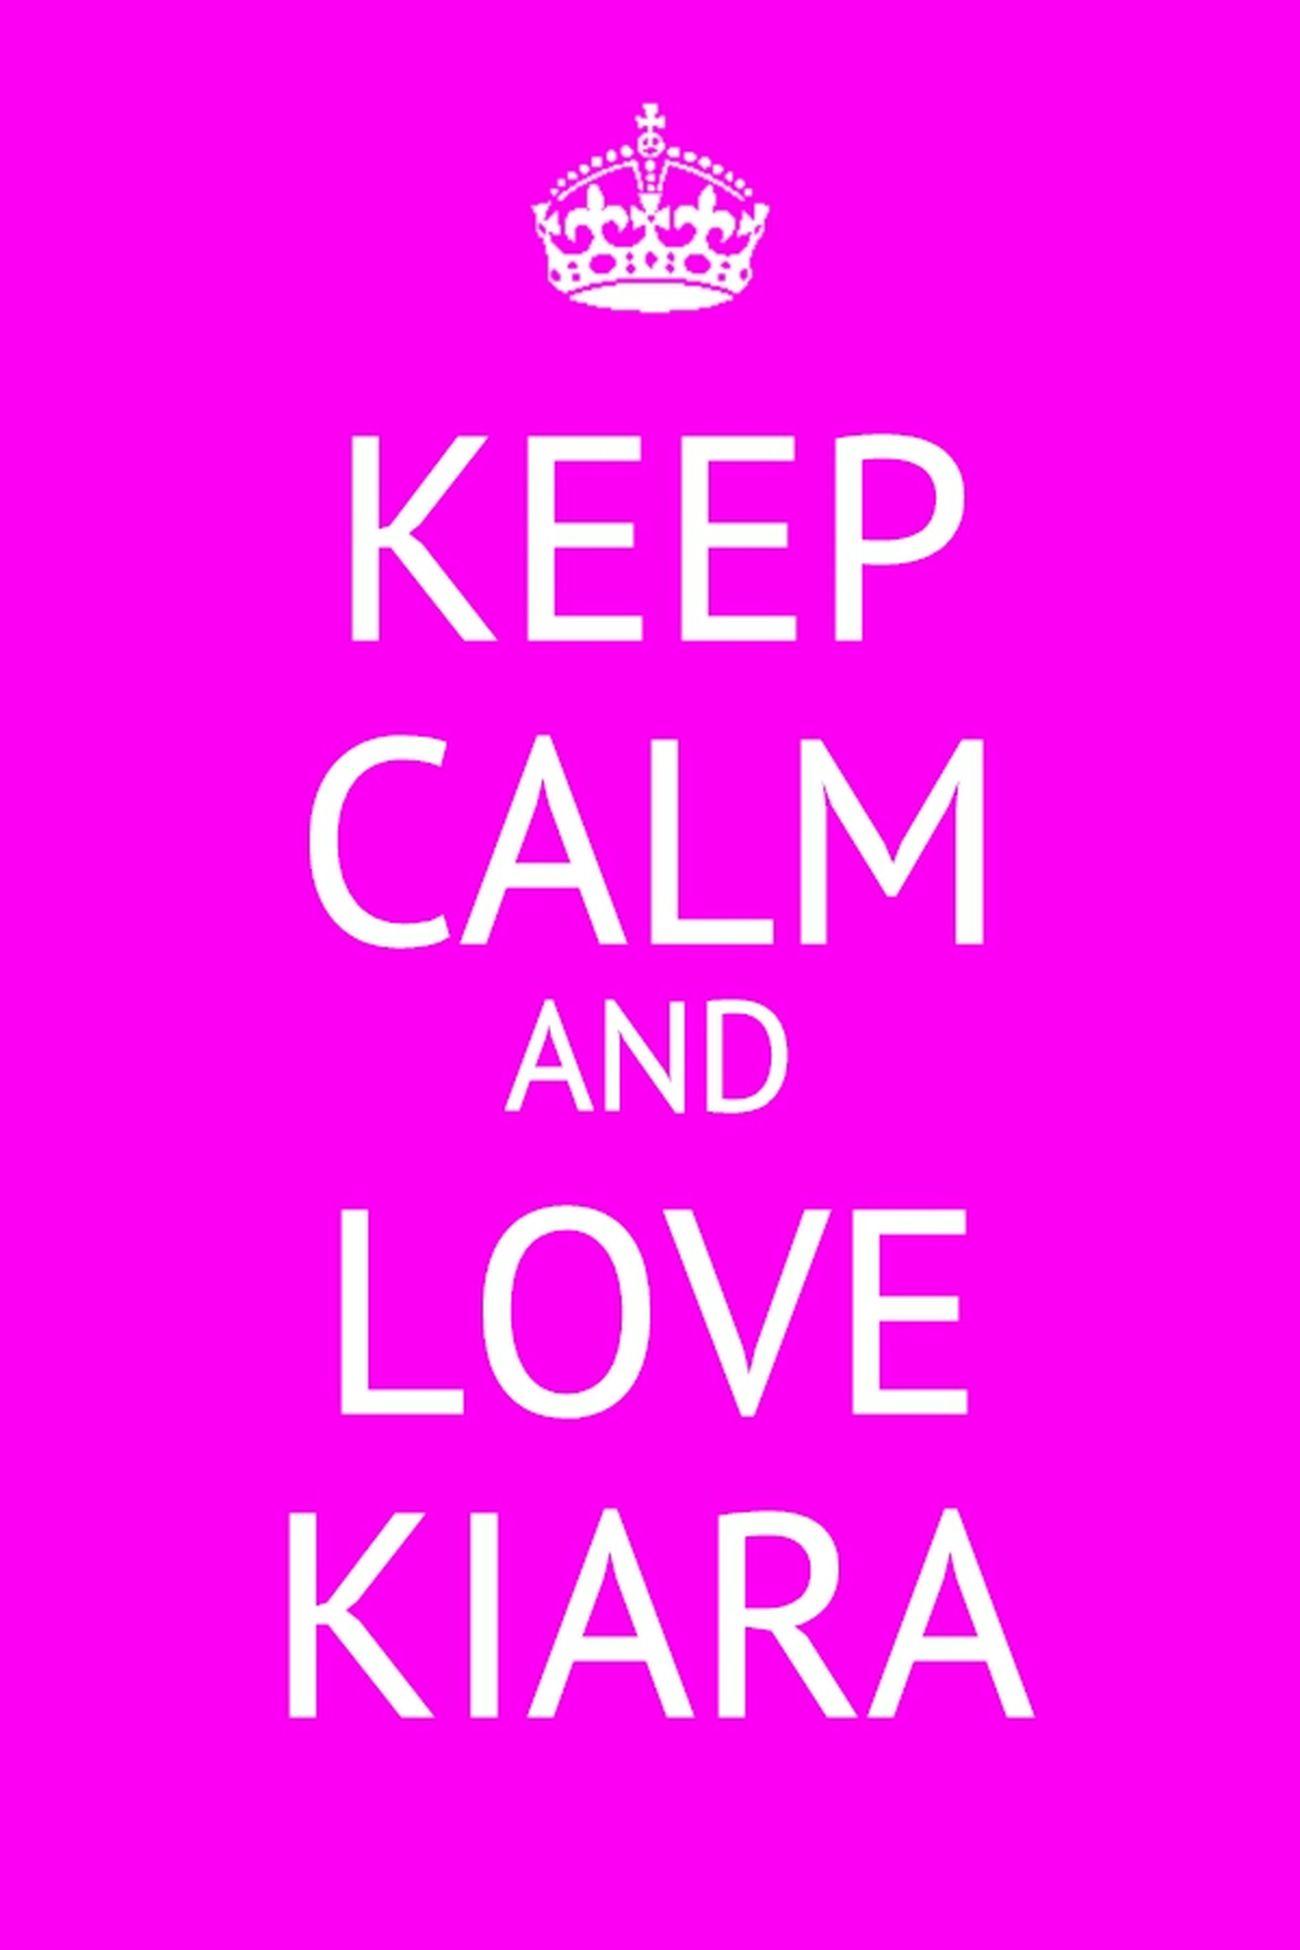 KEEP CALM AND LOVE KIARA